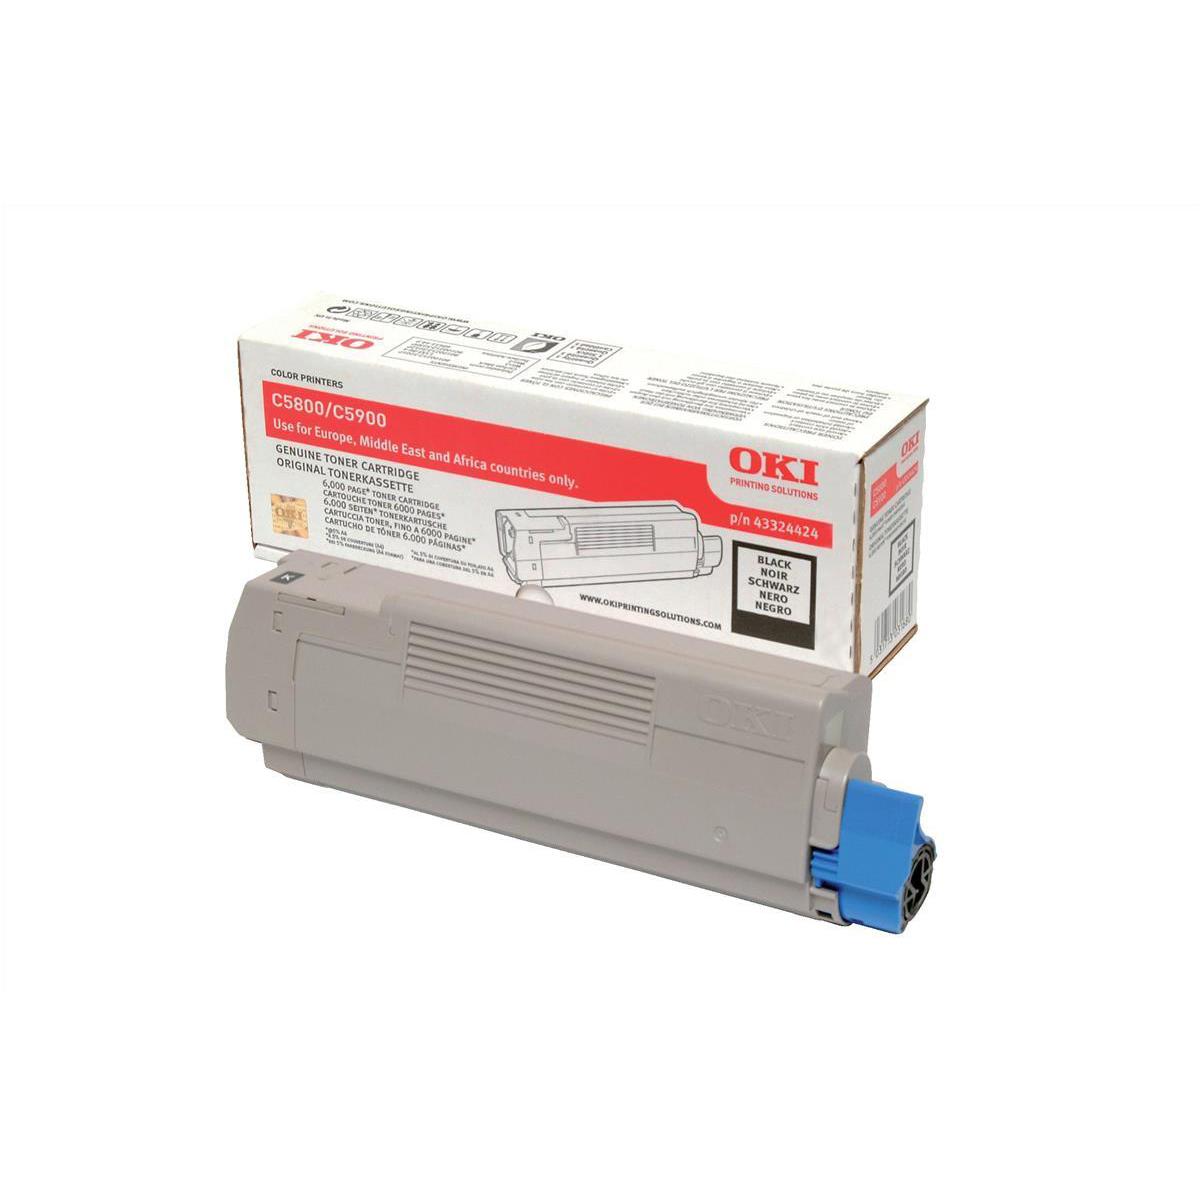 OKI Laser Toner Cartridge Page Life 6000pp Black Ref 43324424